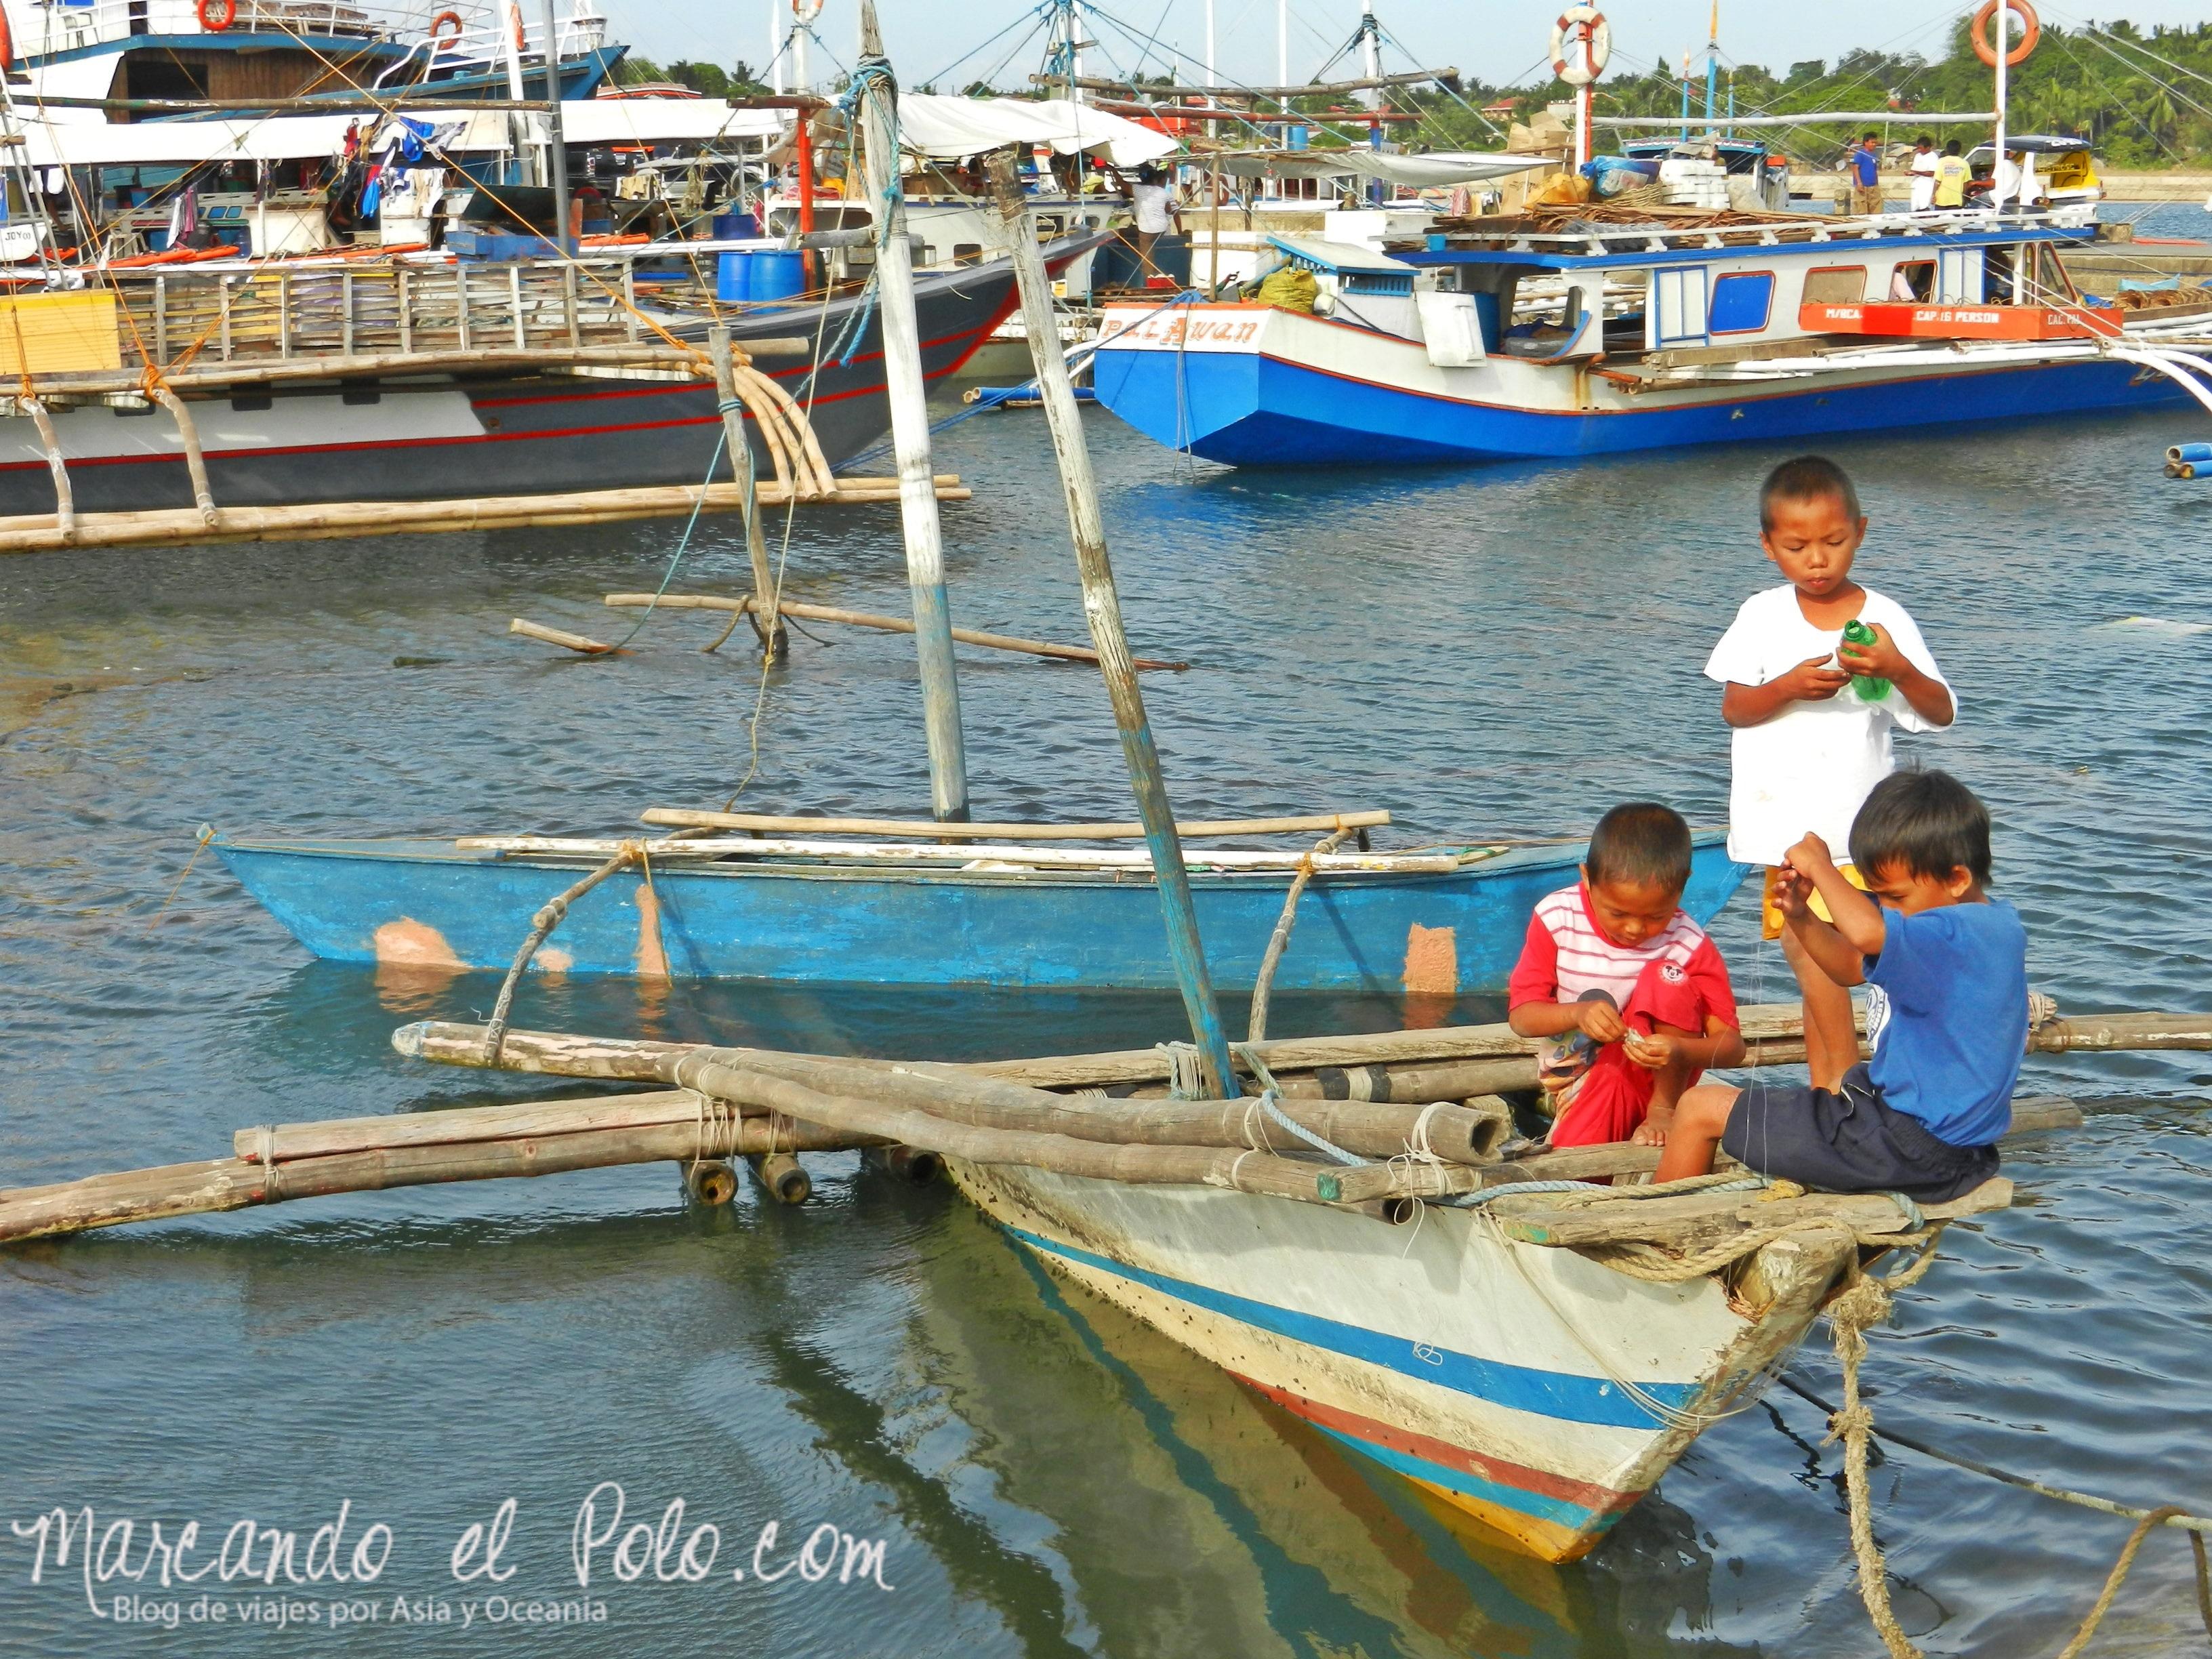 Viajar a Palawan: Puerto Princesa